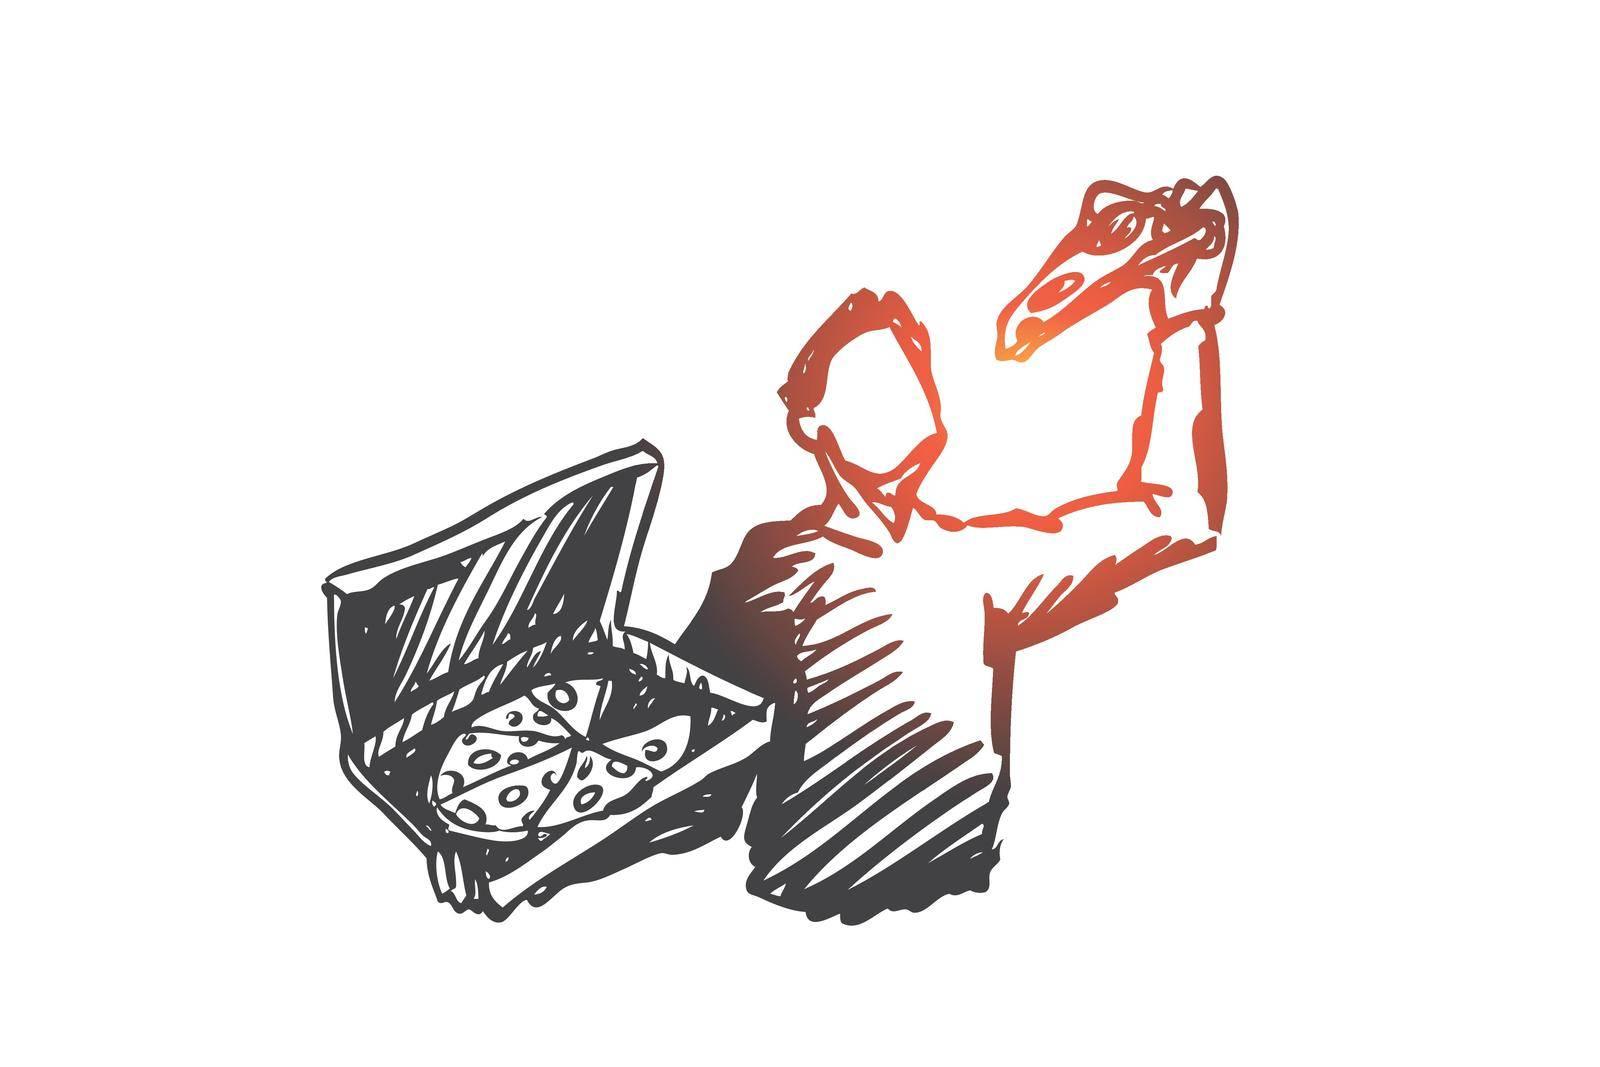 Pizza, man, dinner, food, Italian concept. Hand drawn isolated vector. by Vasilyeva